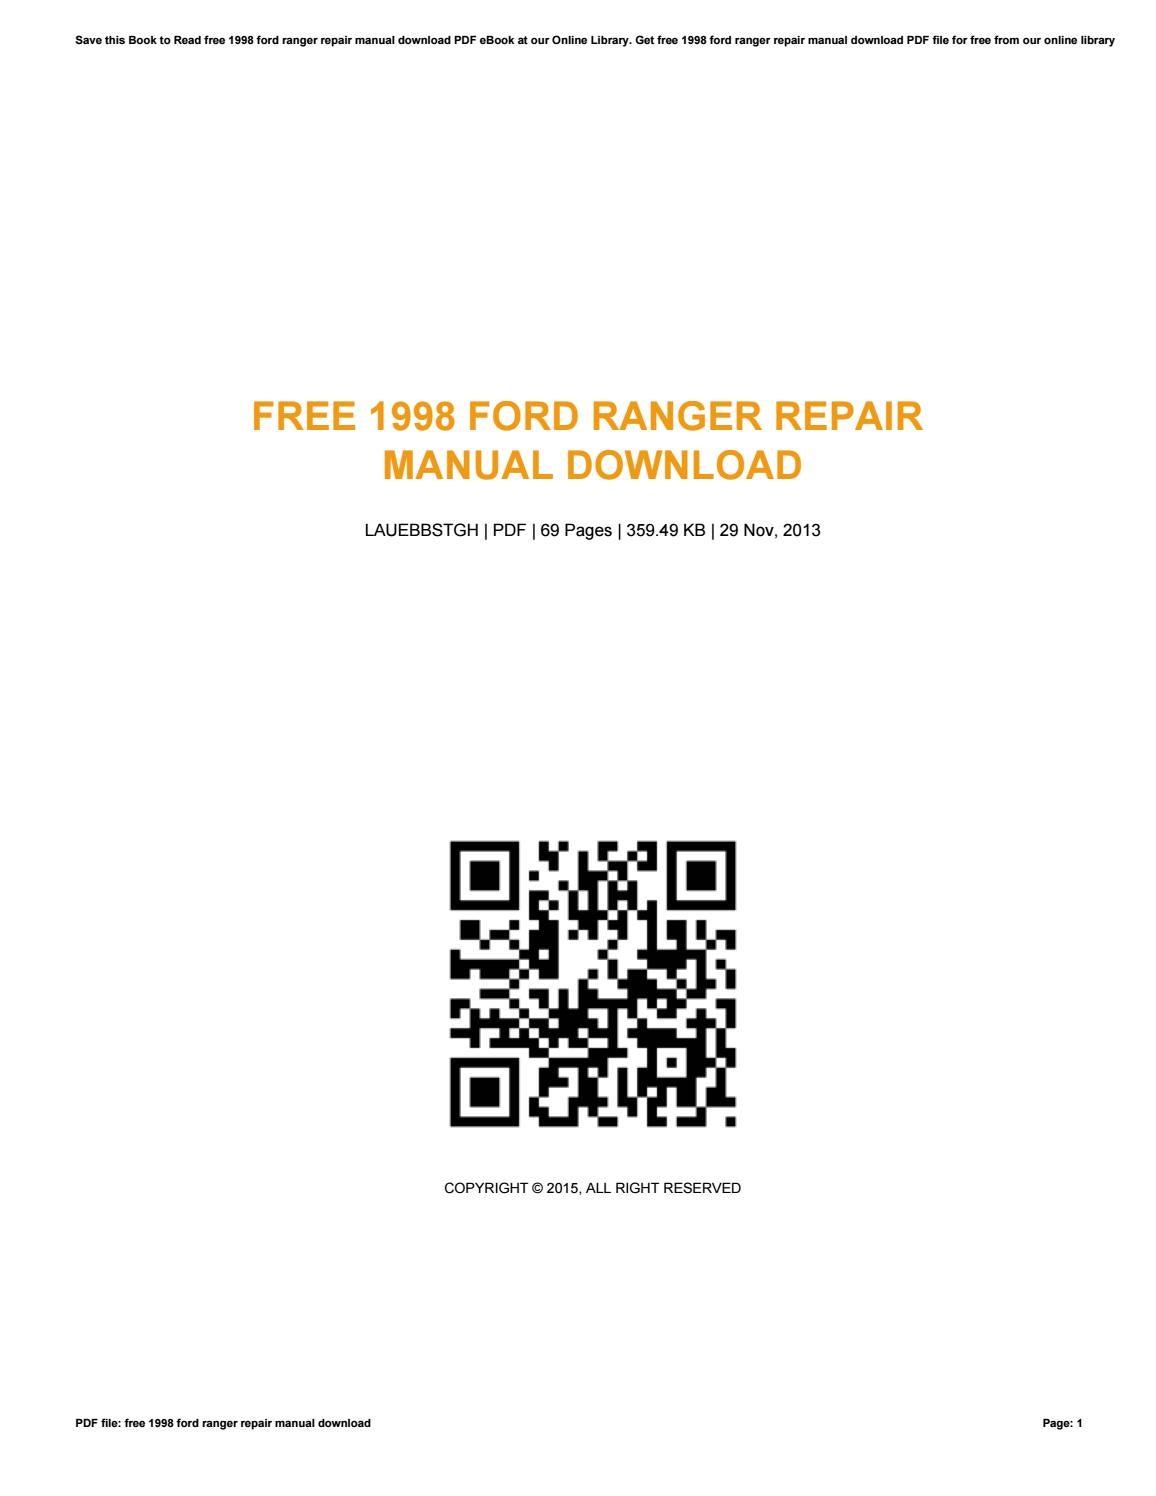 Ford Ranger Font Free Download